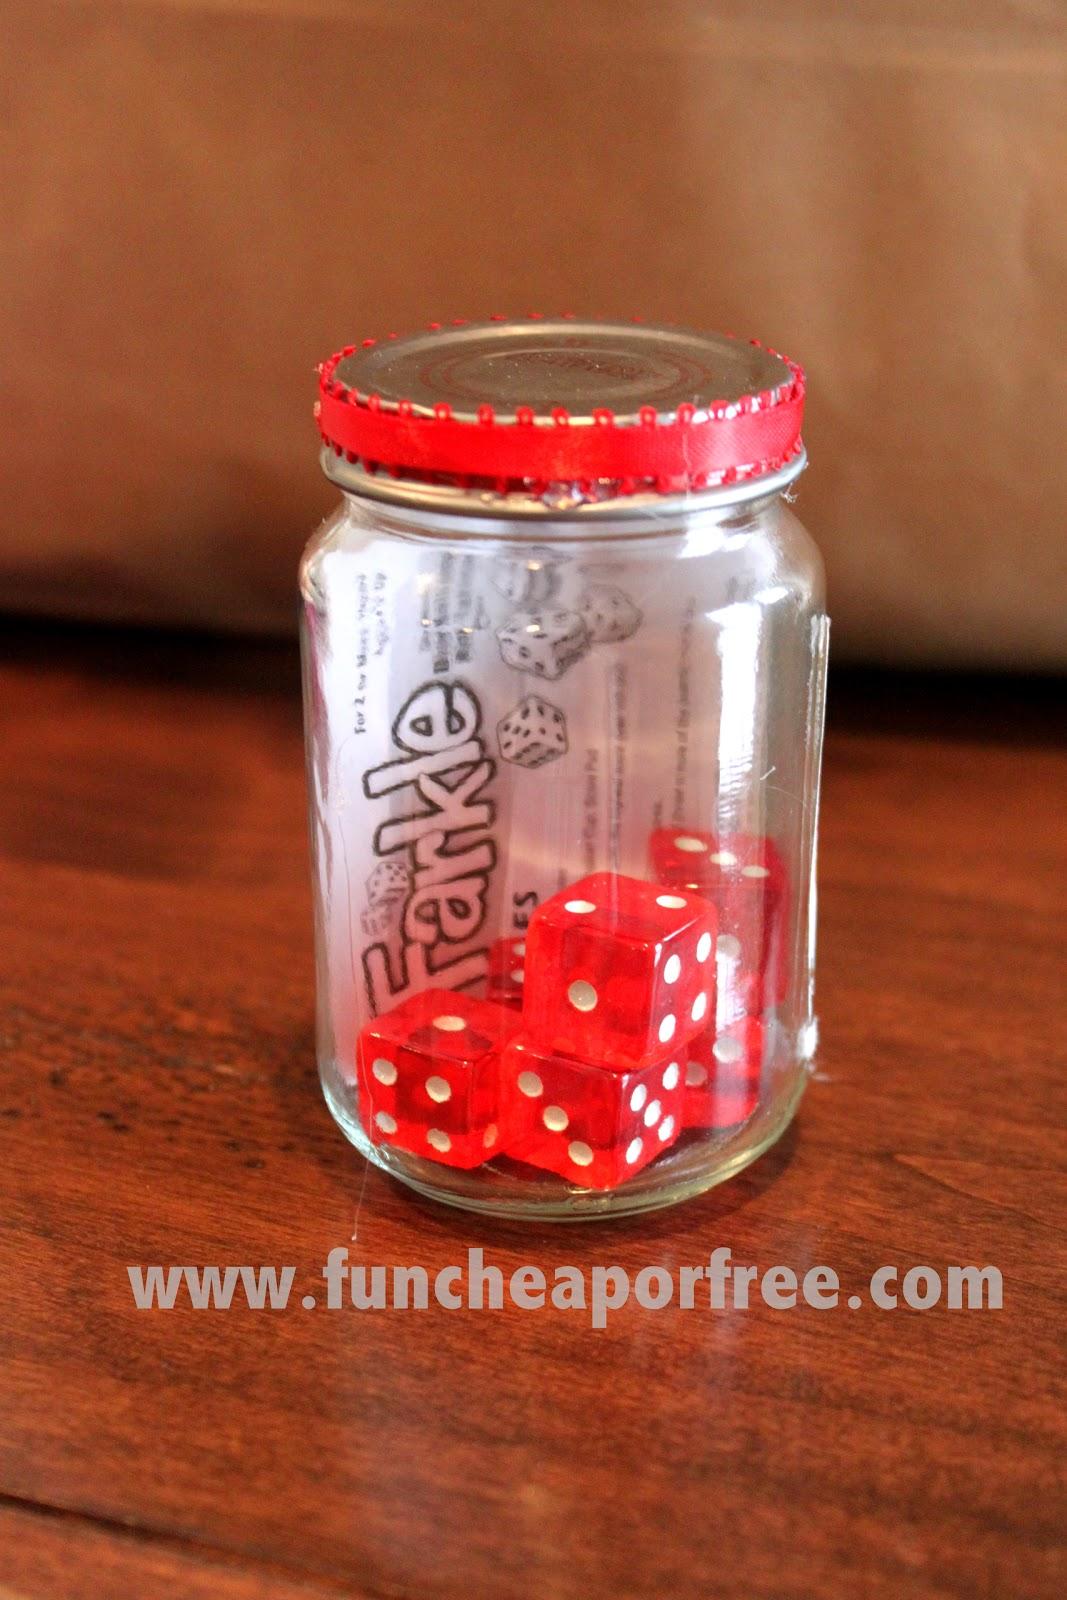 Neighbor Gift Ideas + DIY Travel Farkle Game - Fun Cheap ...